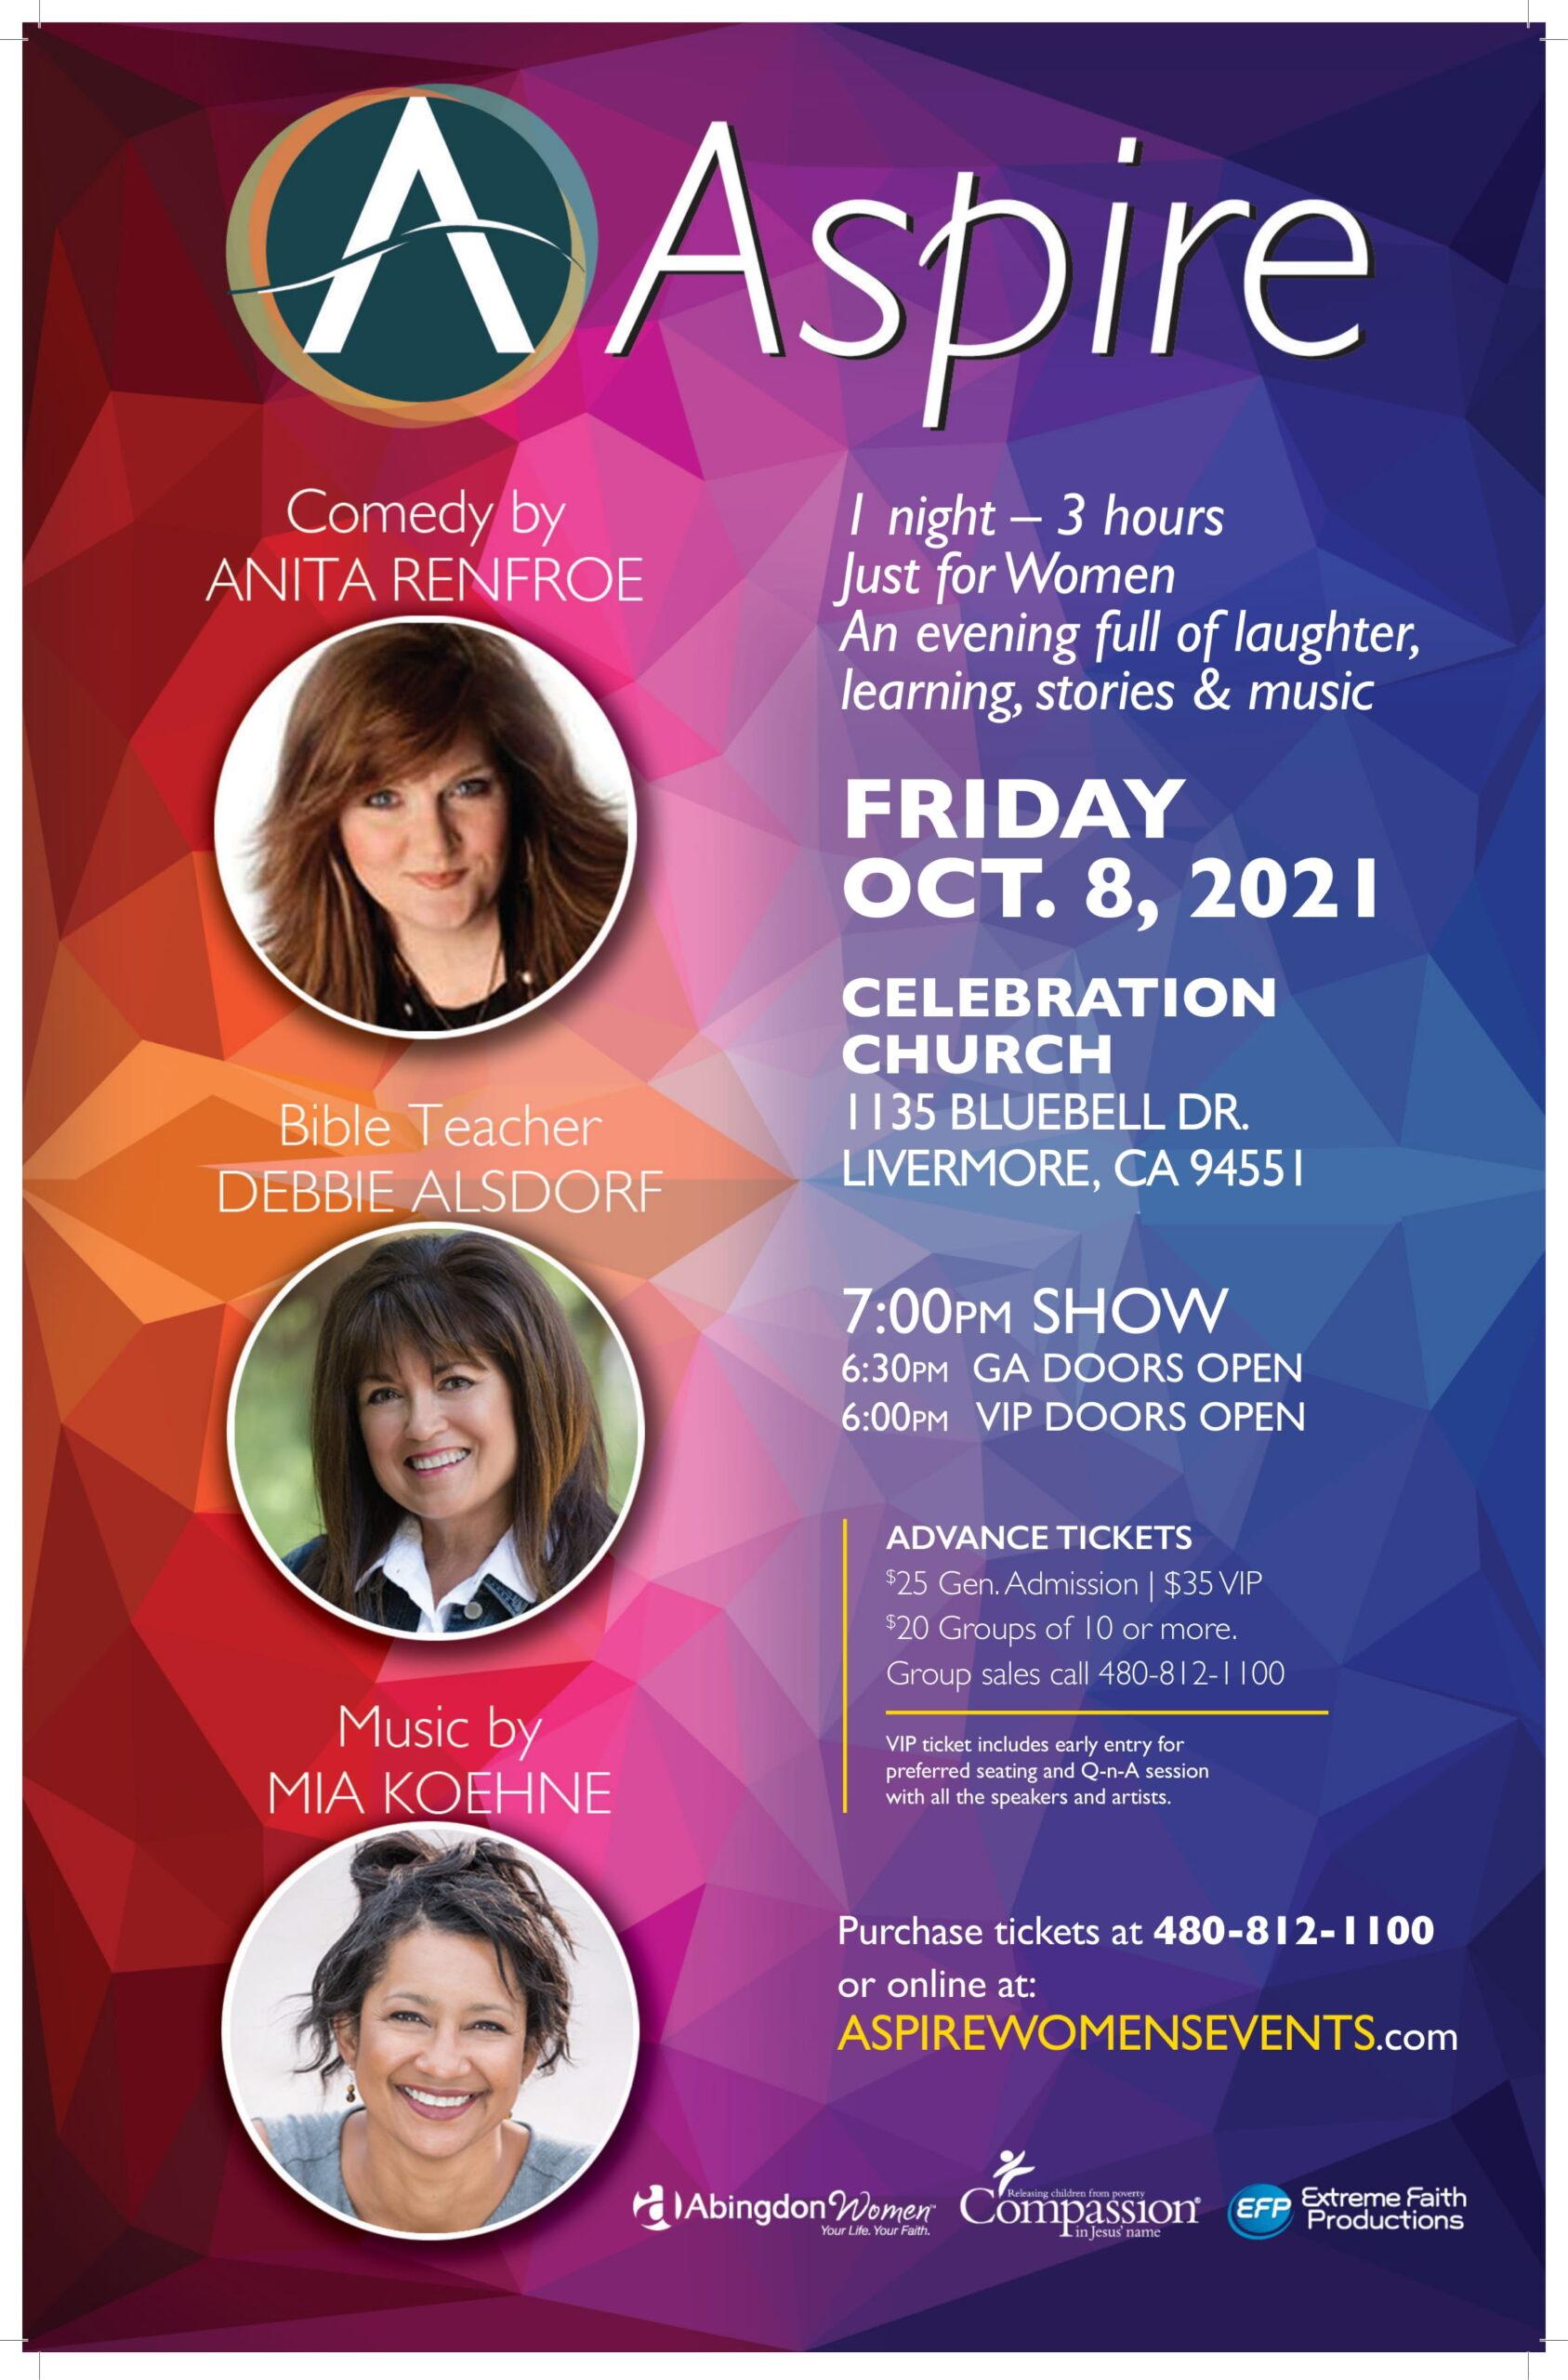 ASPIRE FRI Oct 8 Livermore CA-Poster